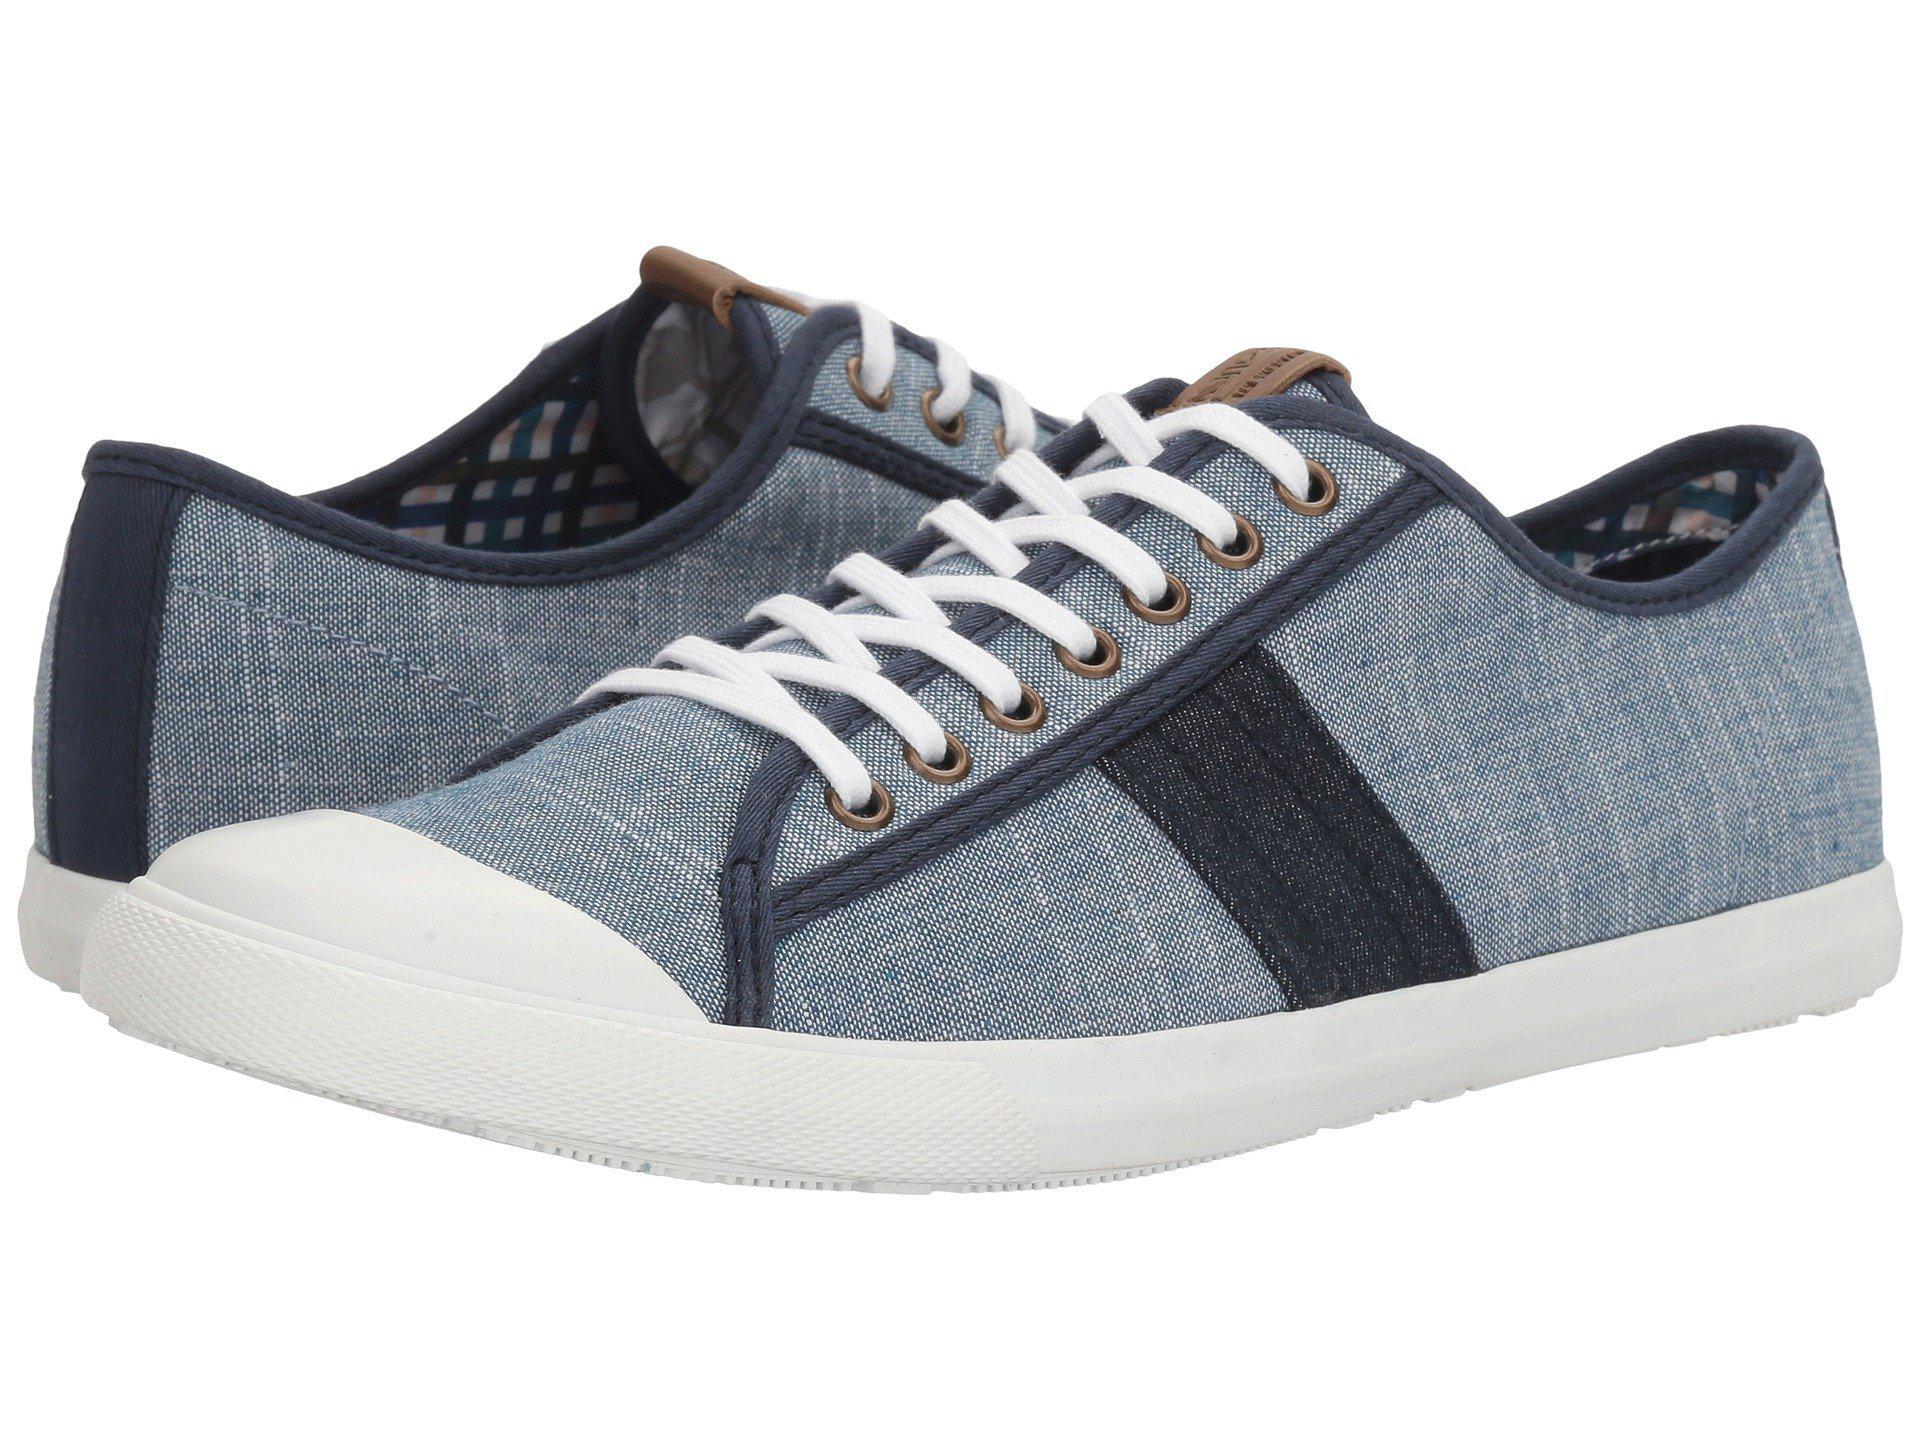 Cheap New Arrivals Ben Sherman Eddie Men Round Toe Canvas Gray Sneakers Mens Grey Ben Sherman Mens Sneakers